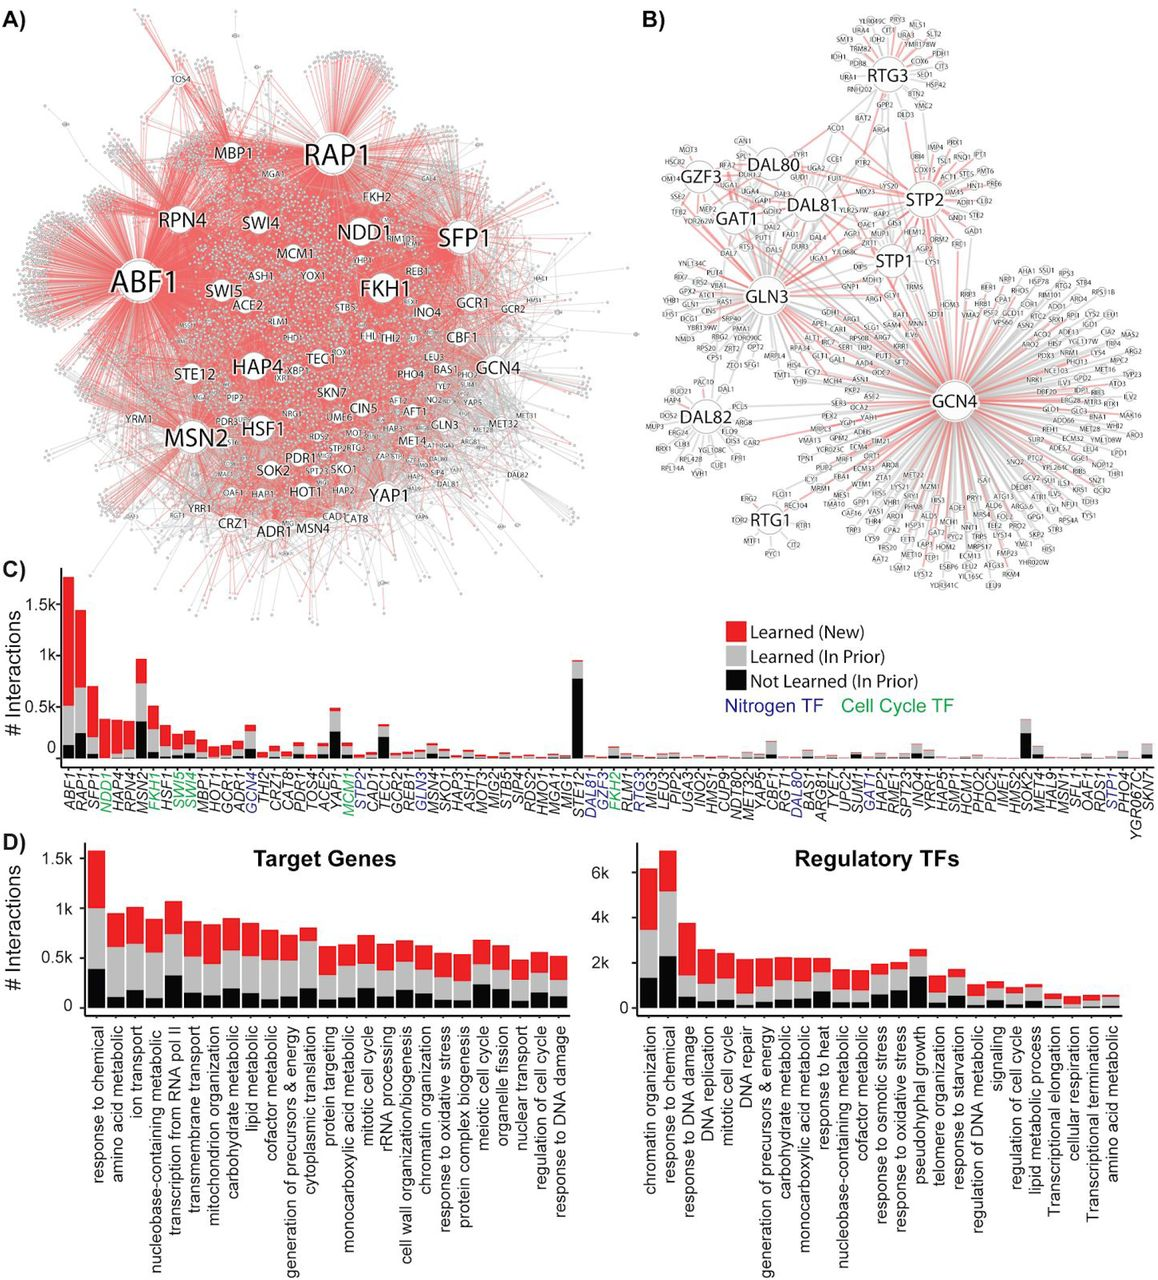 Gene regulatory network reconstruction using single-cell RNA